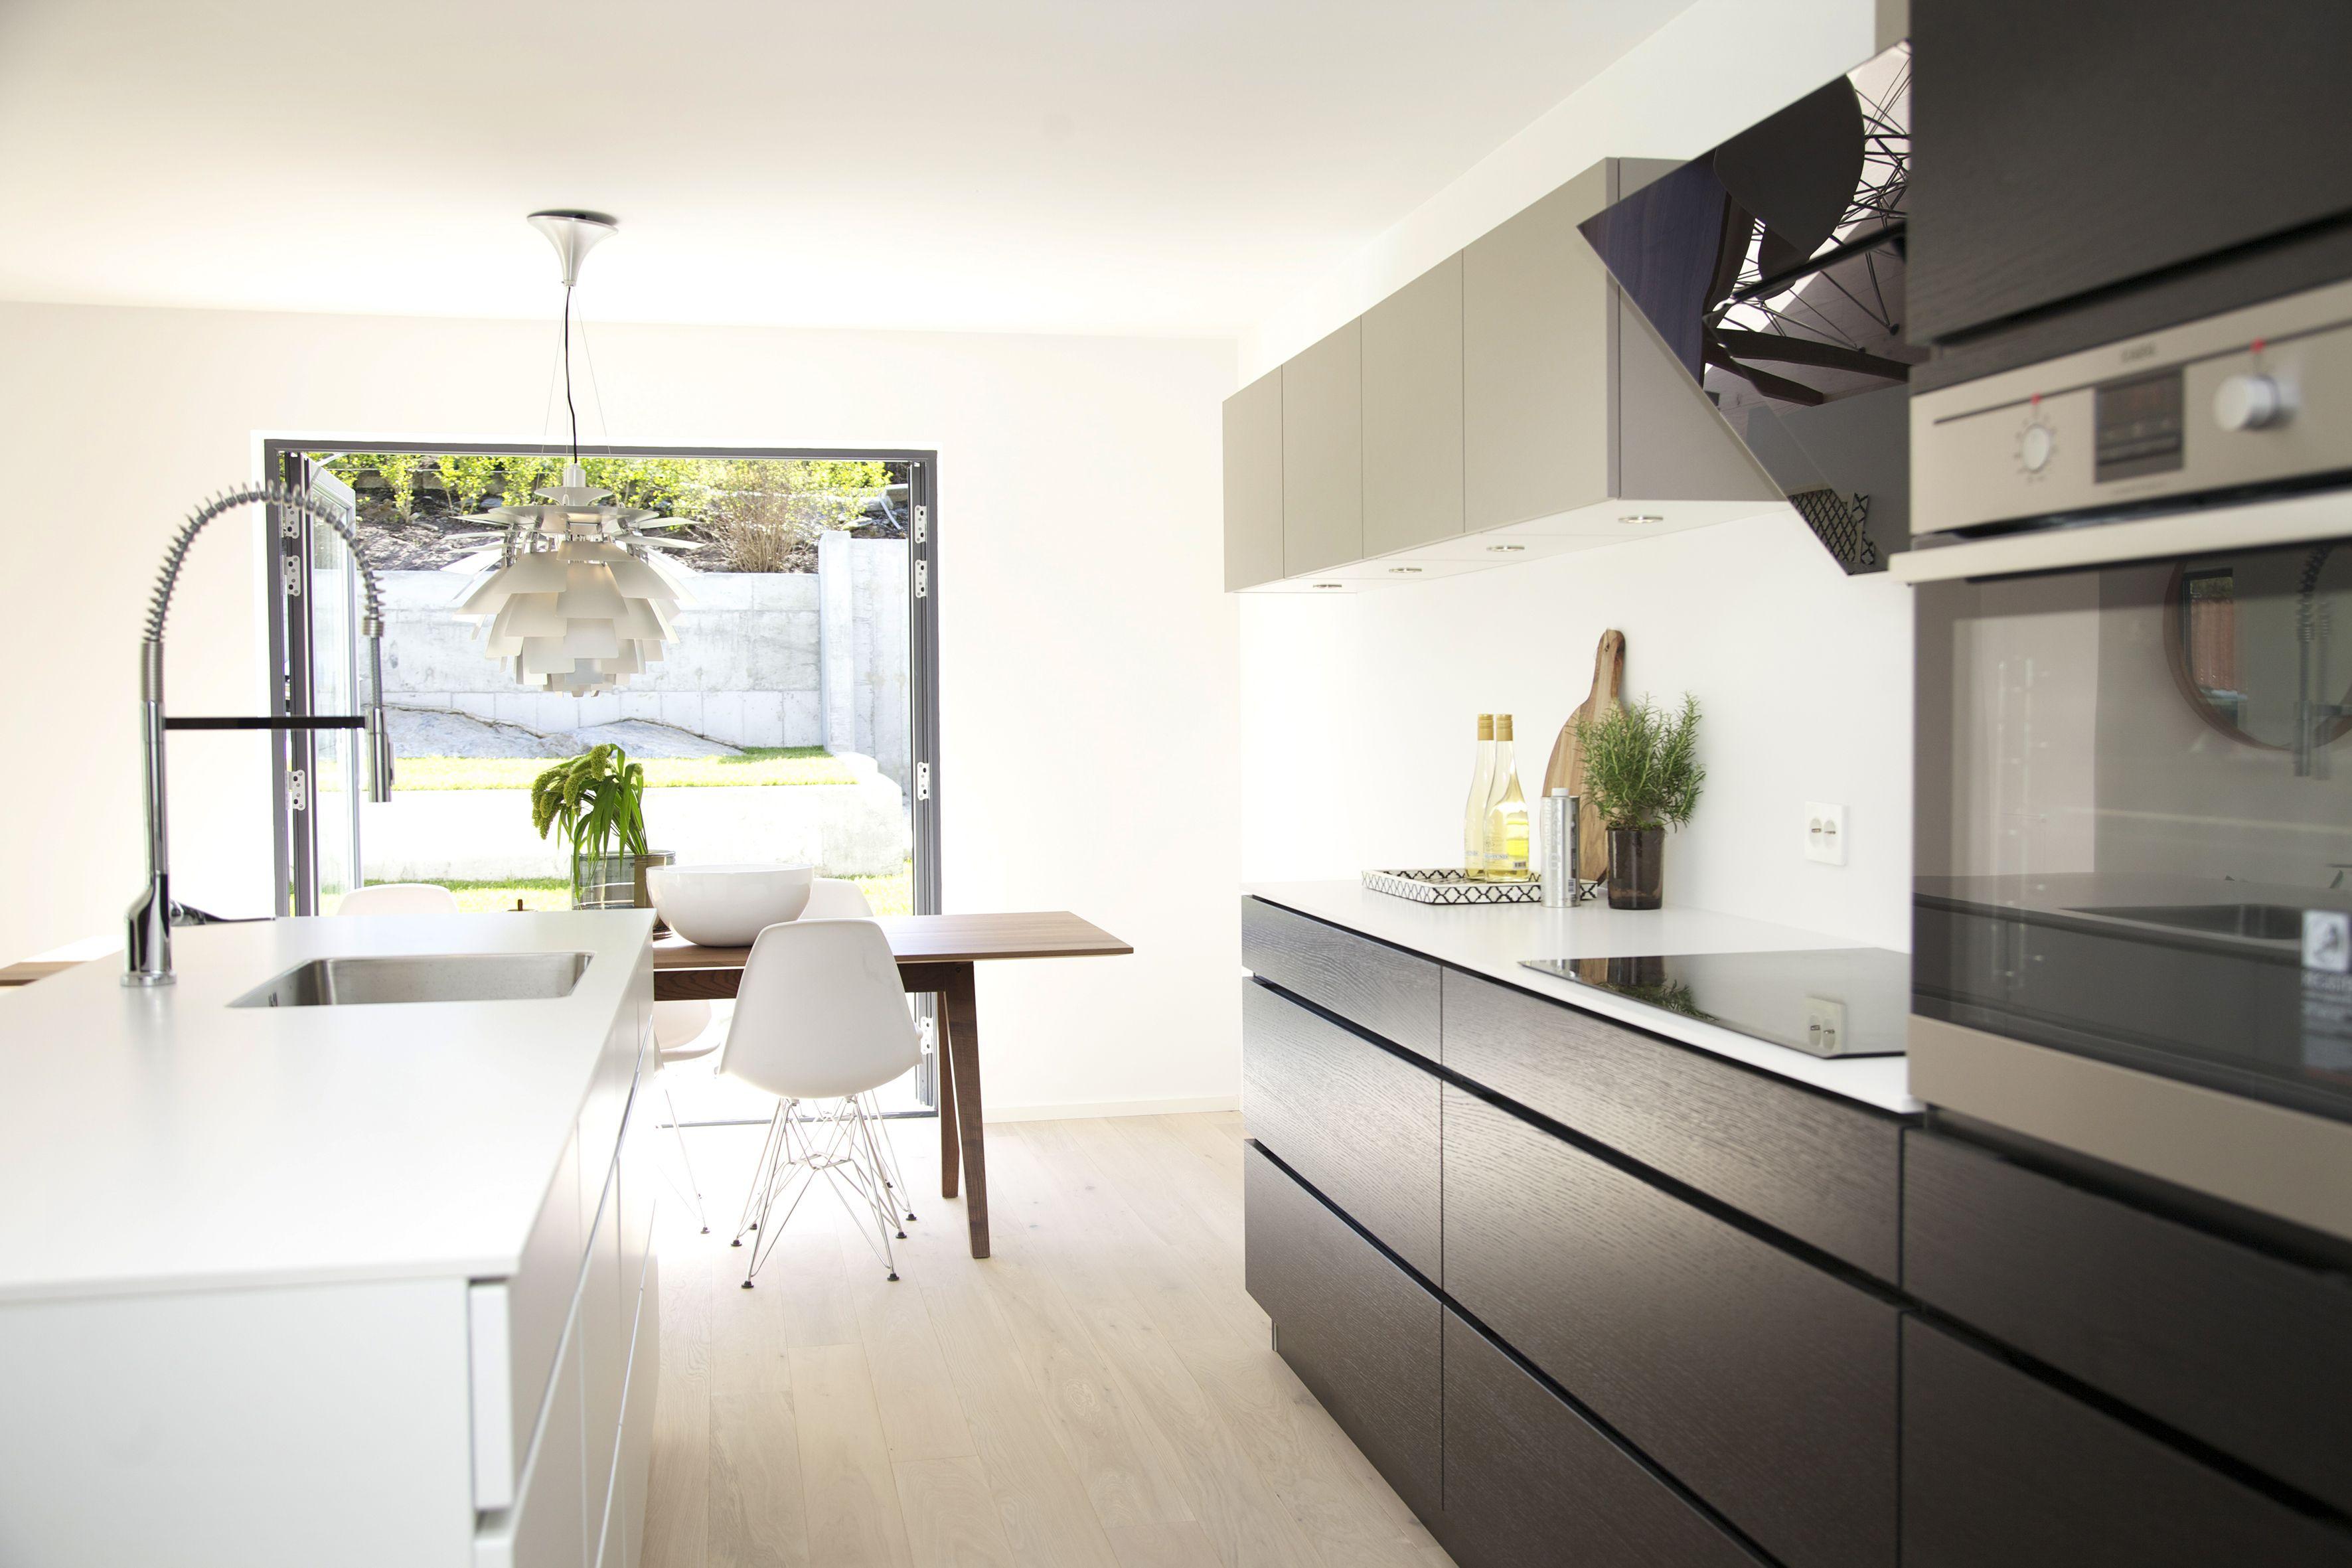 #Urbanhus#Moderne#Minimalistisk#Kj Kken#Modern#Minimalist#Kitchen